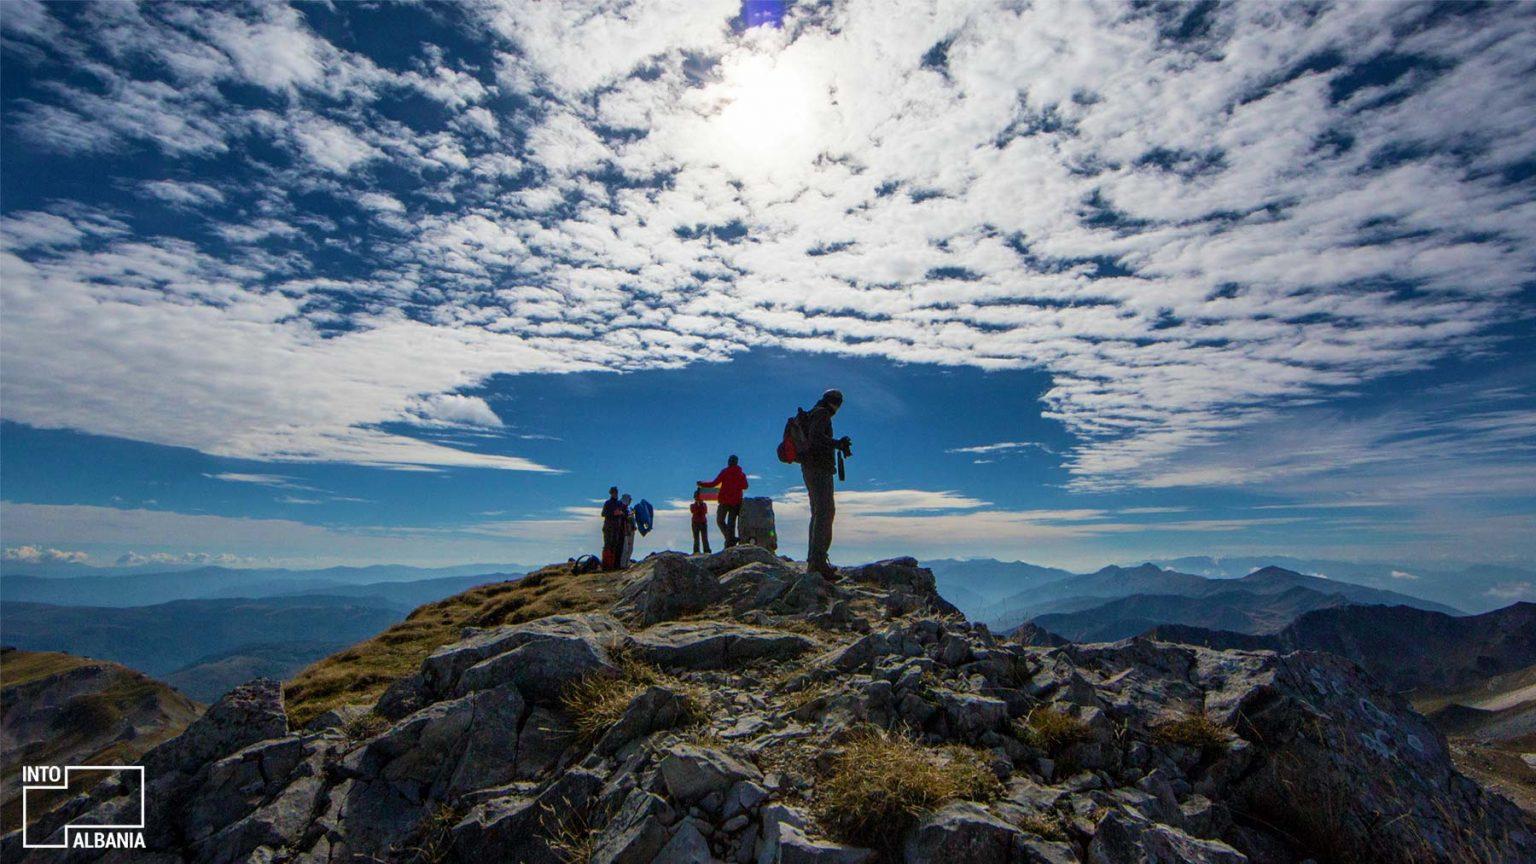 Mountain, Hiking, North Albania